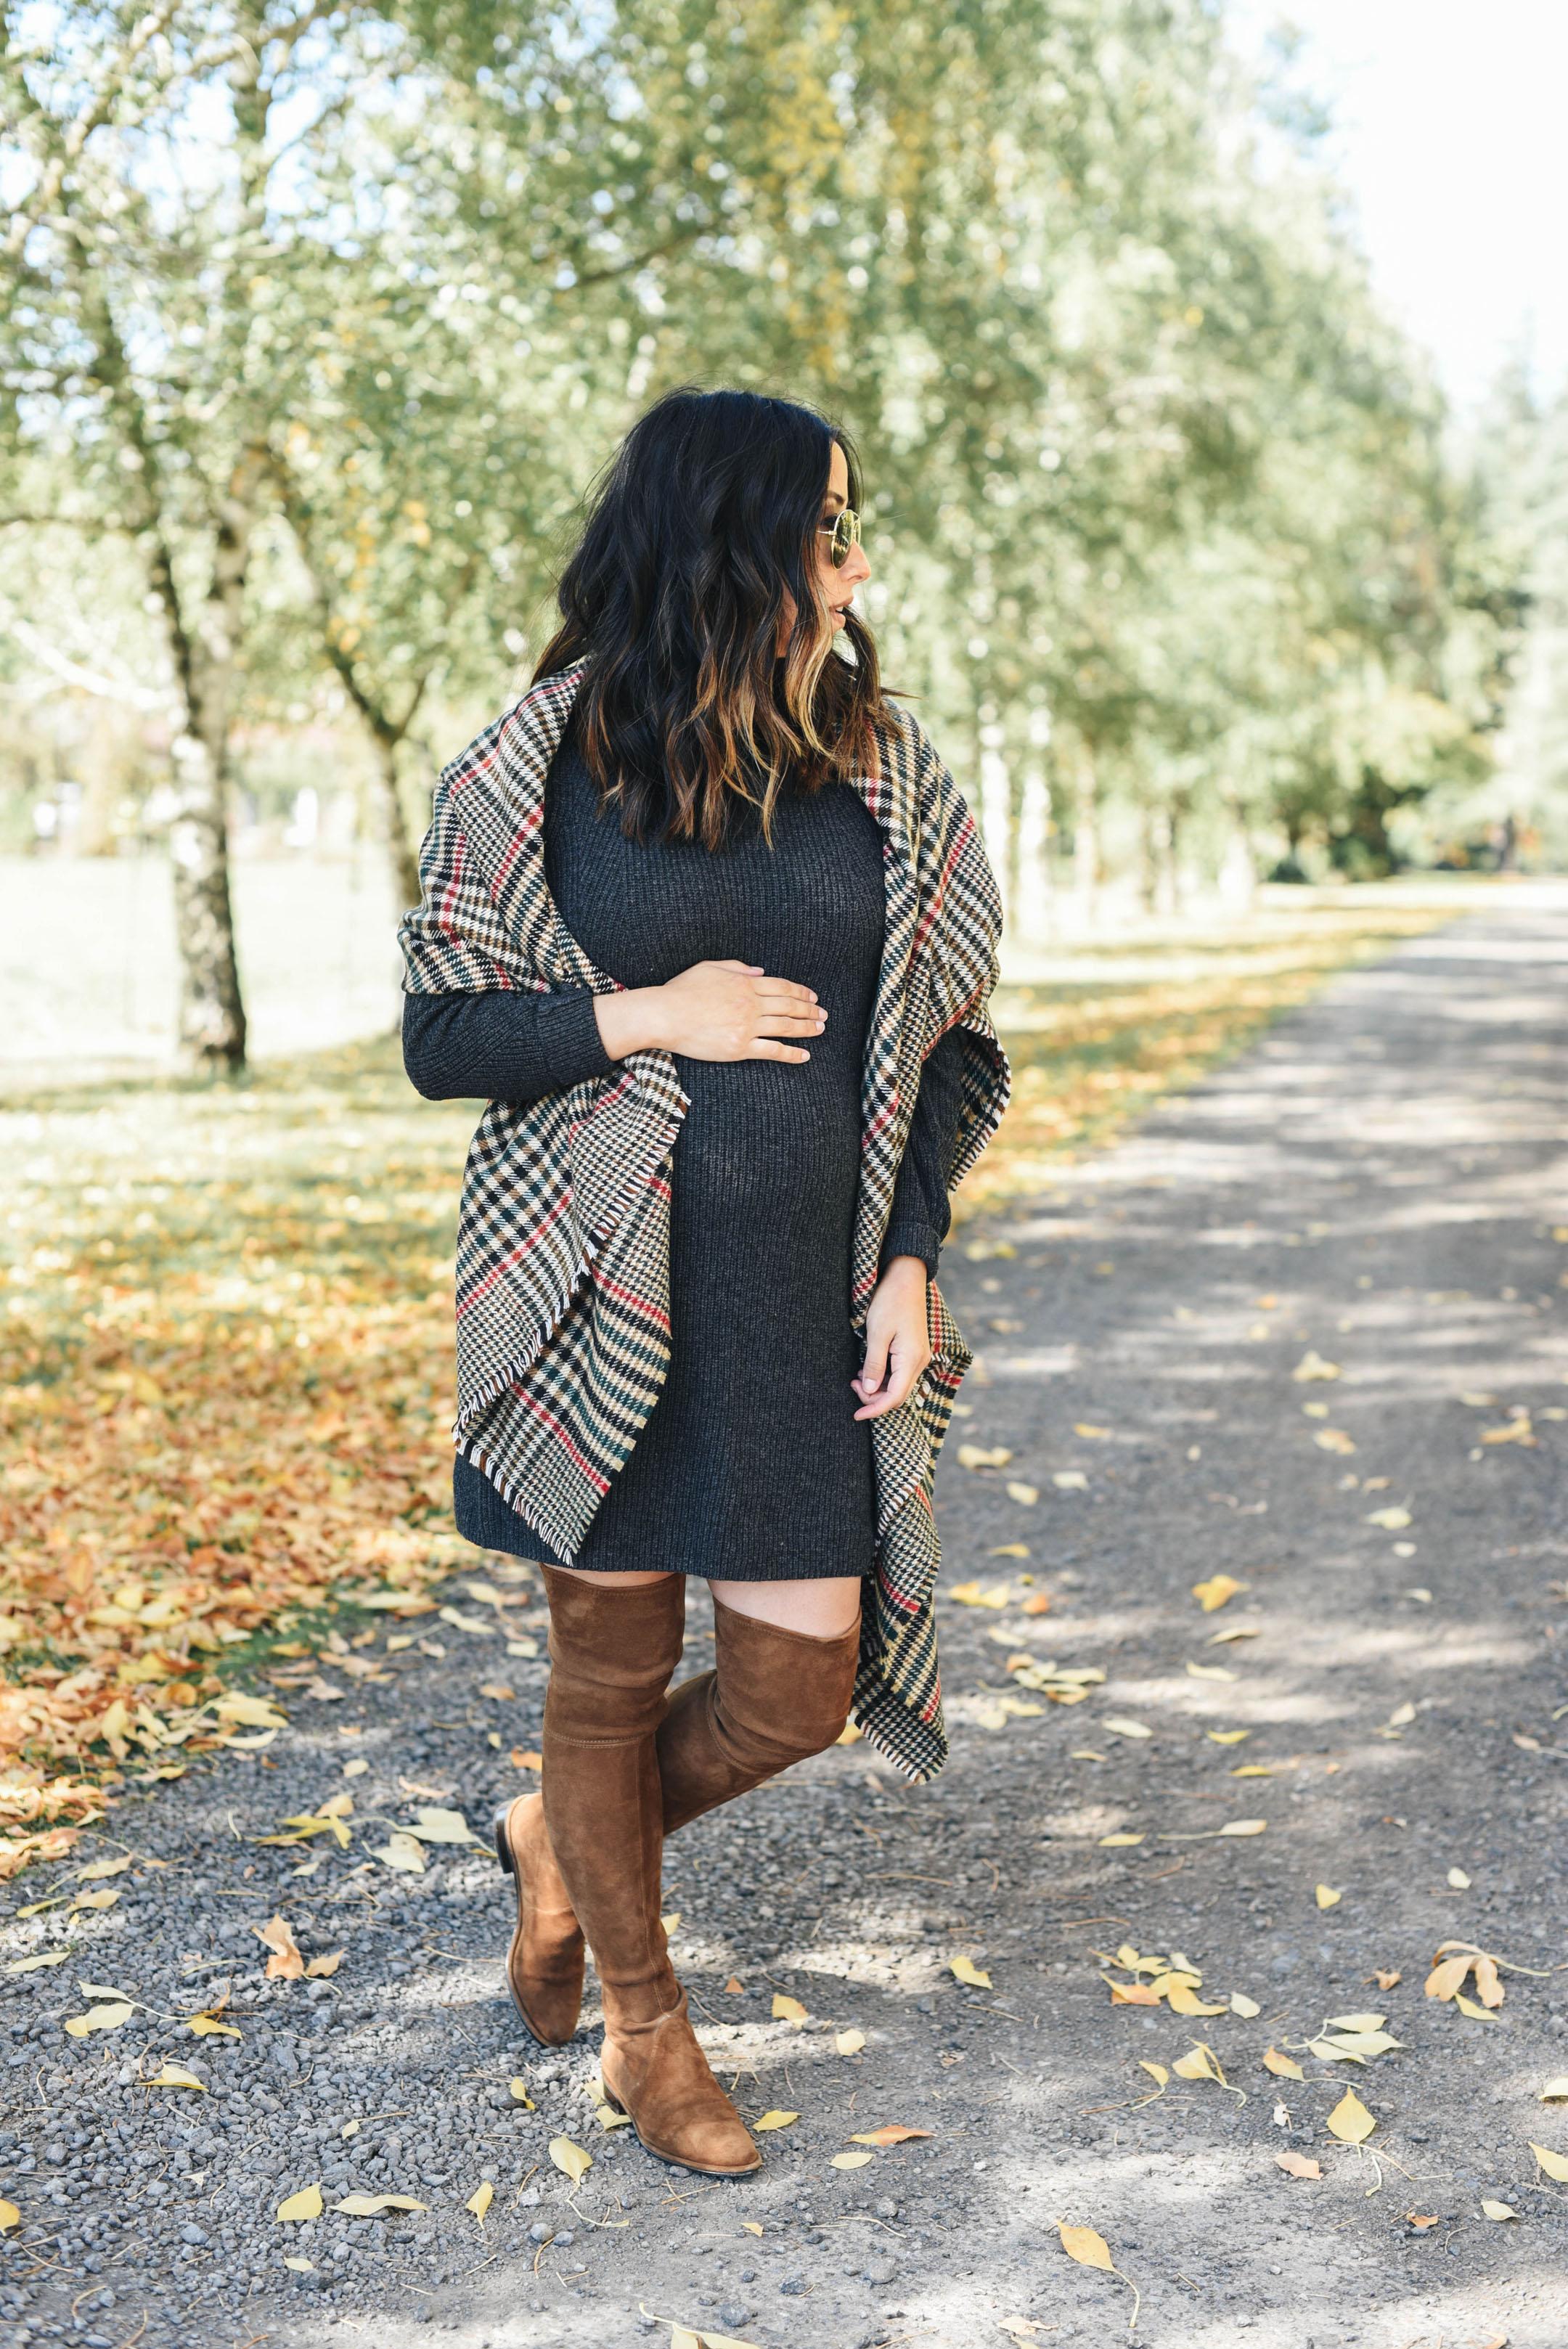 Abercrombie & Fitch petite sweater dress